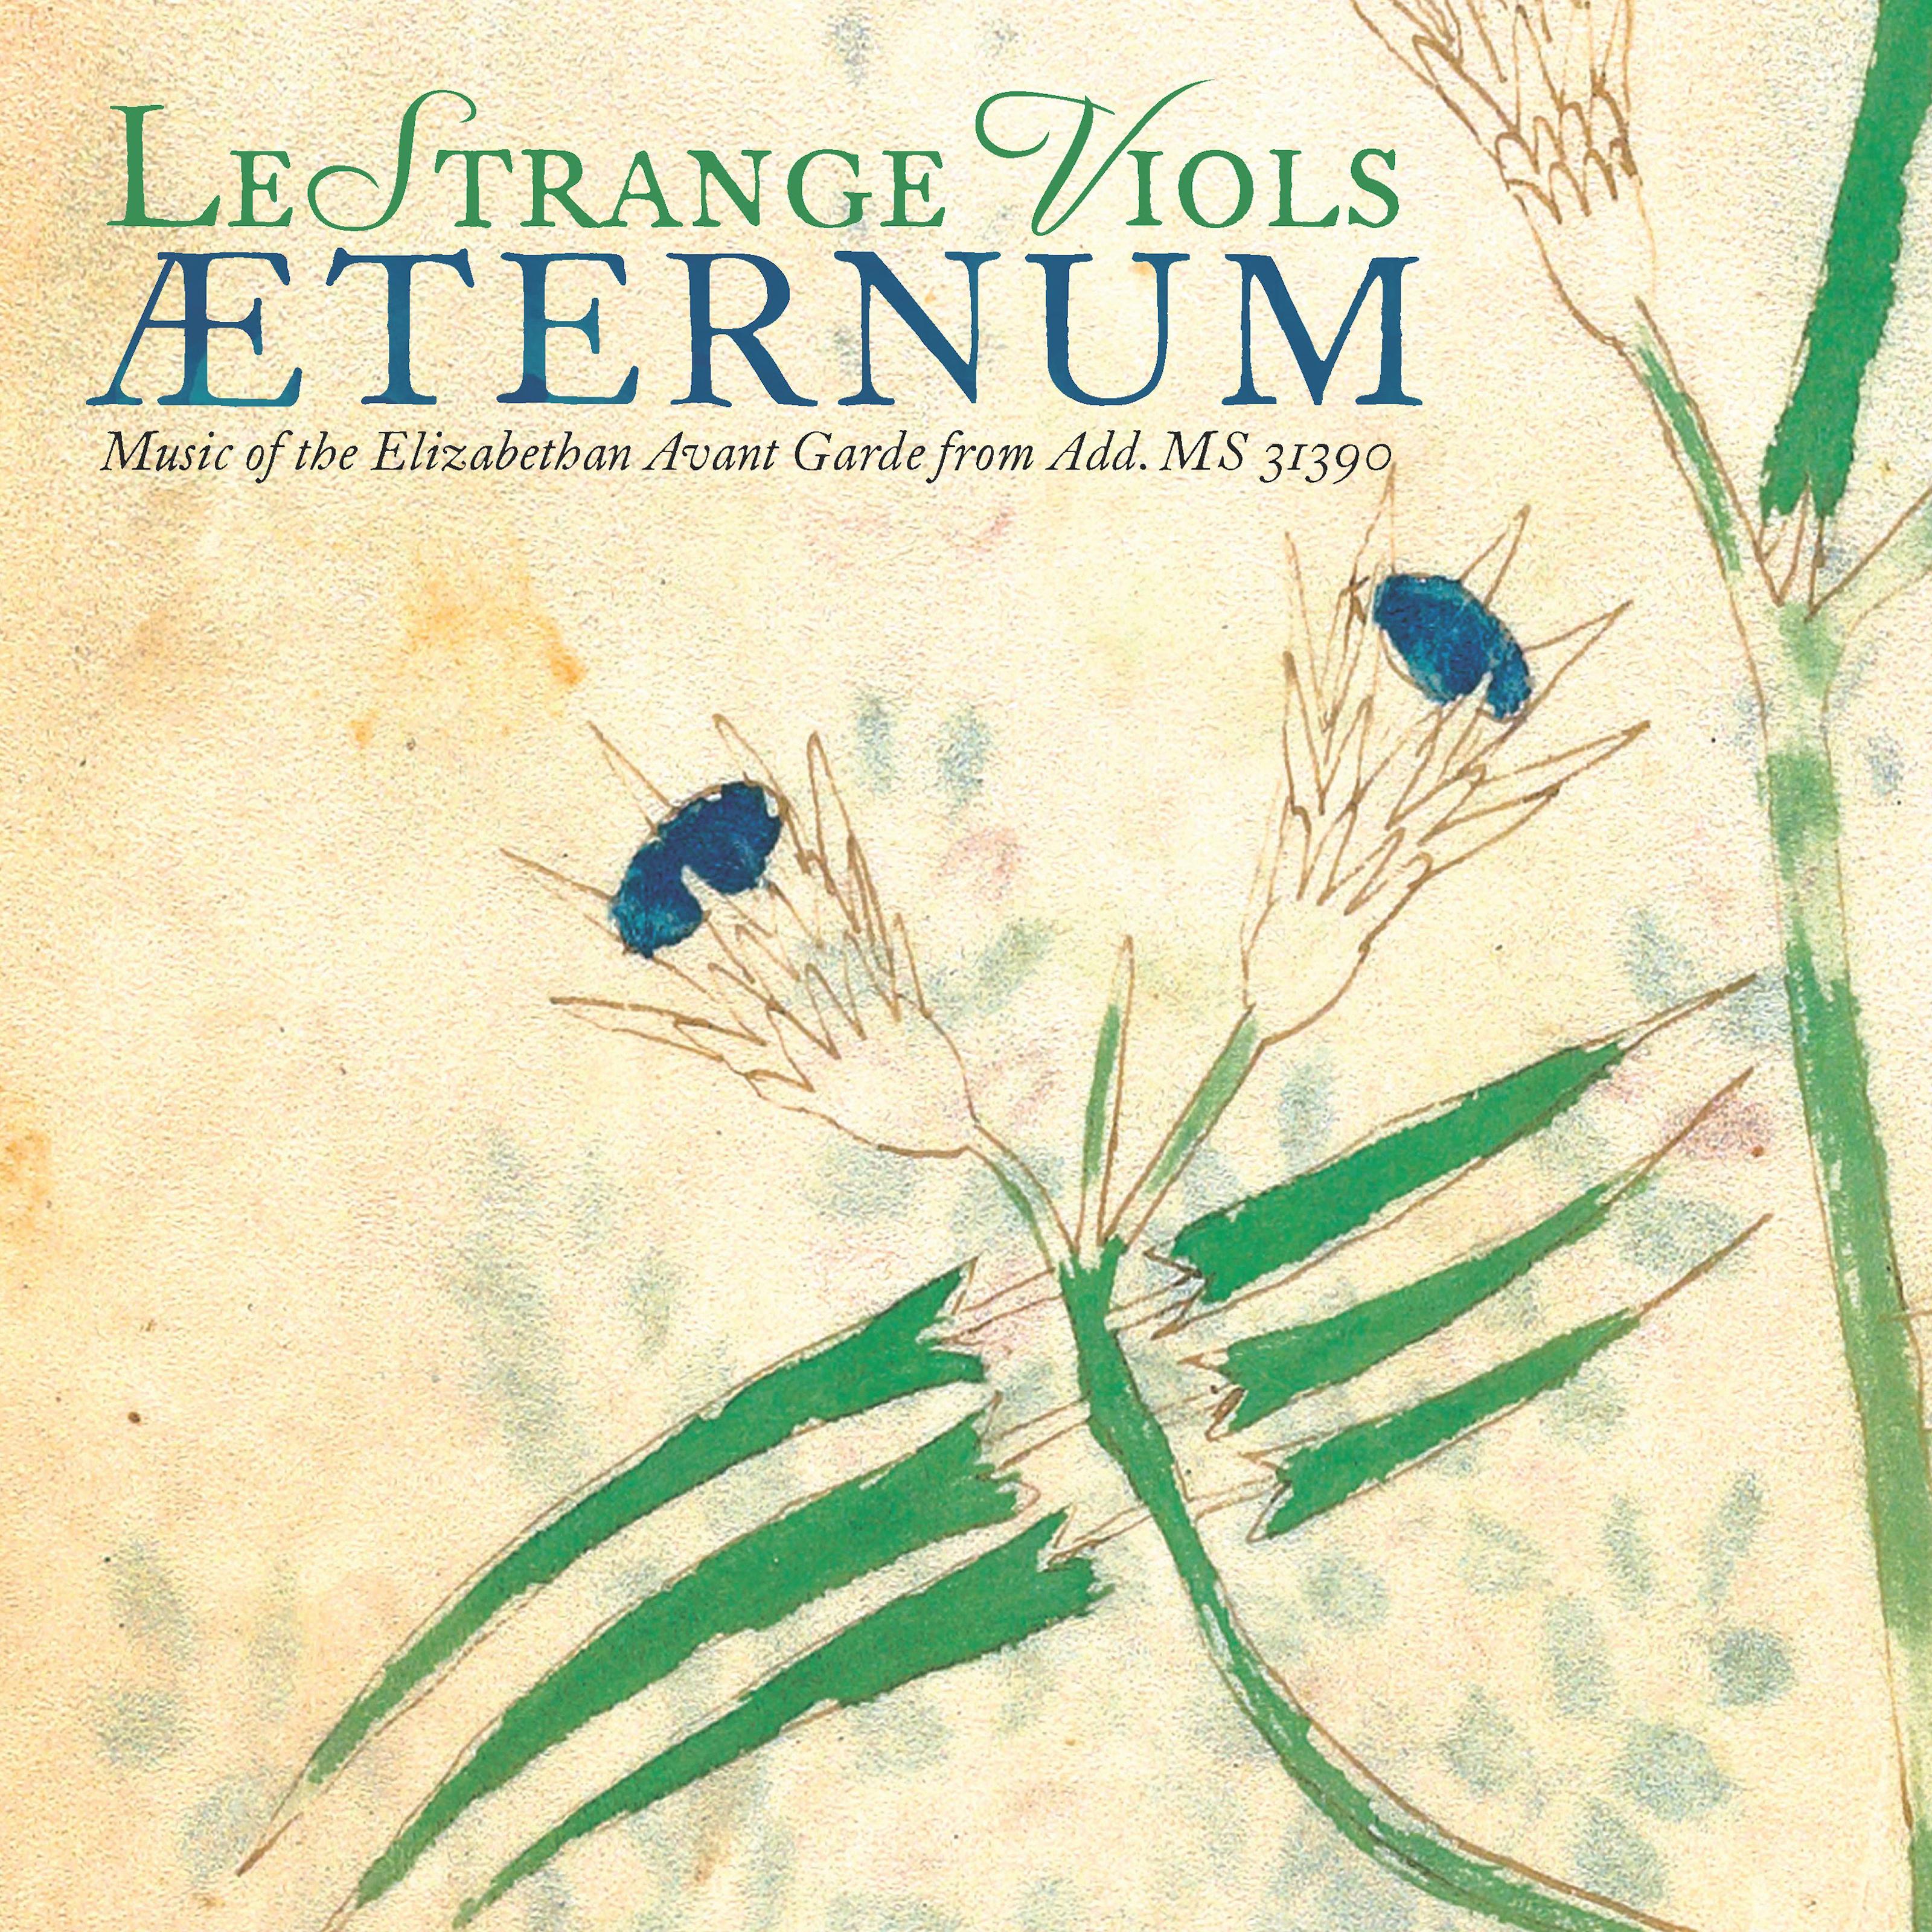 Æternum: Music of the Elizabethan Avant Garde from Add. MS 31390